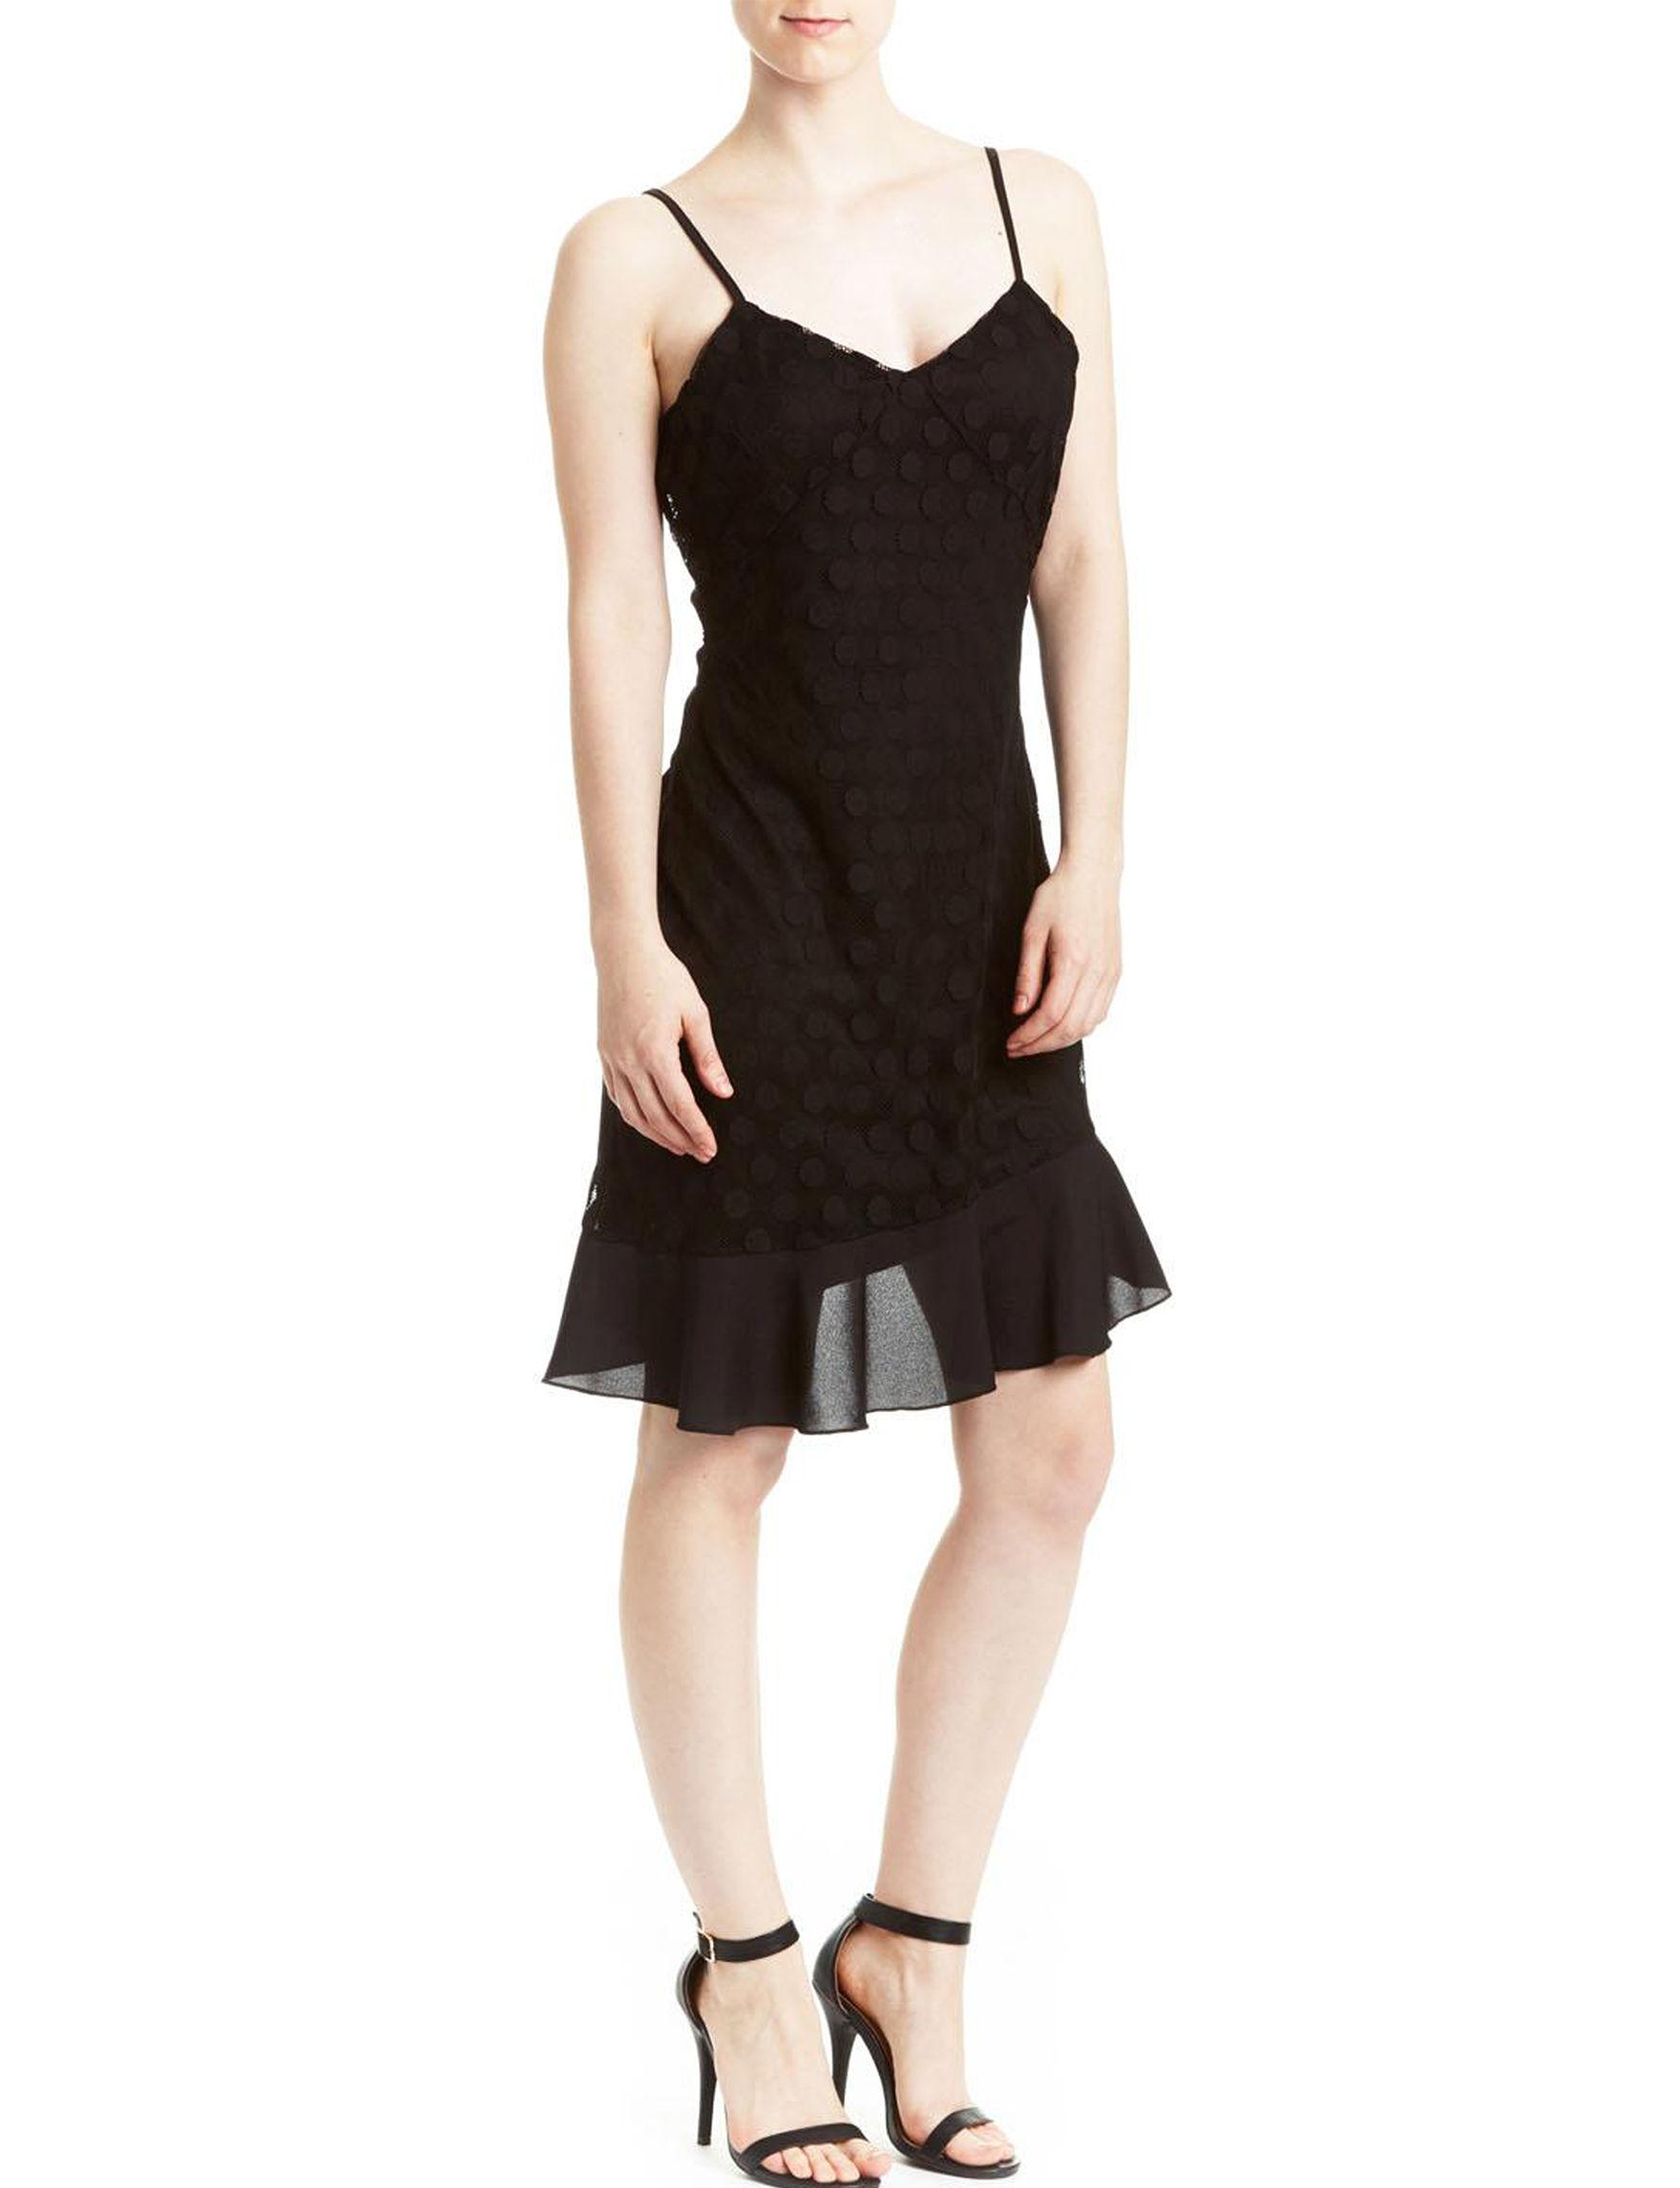 Leola Couture Black Cocktail & Party Shift Dresses